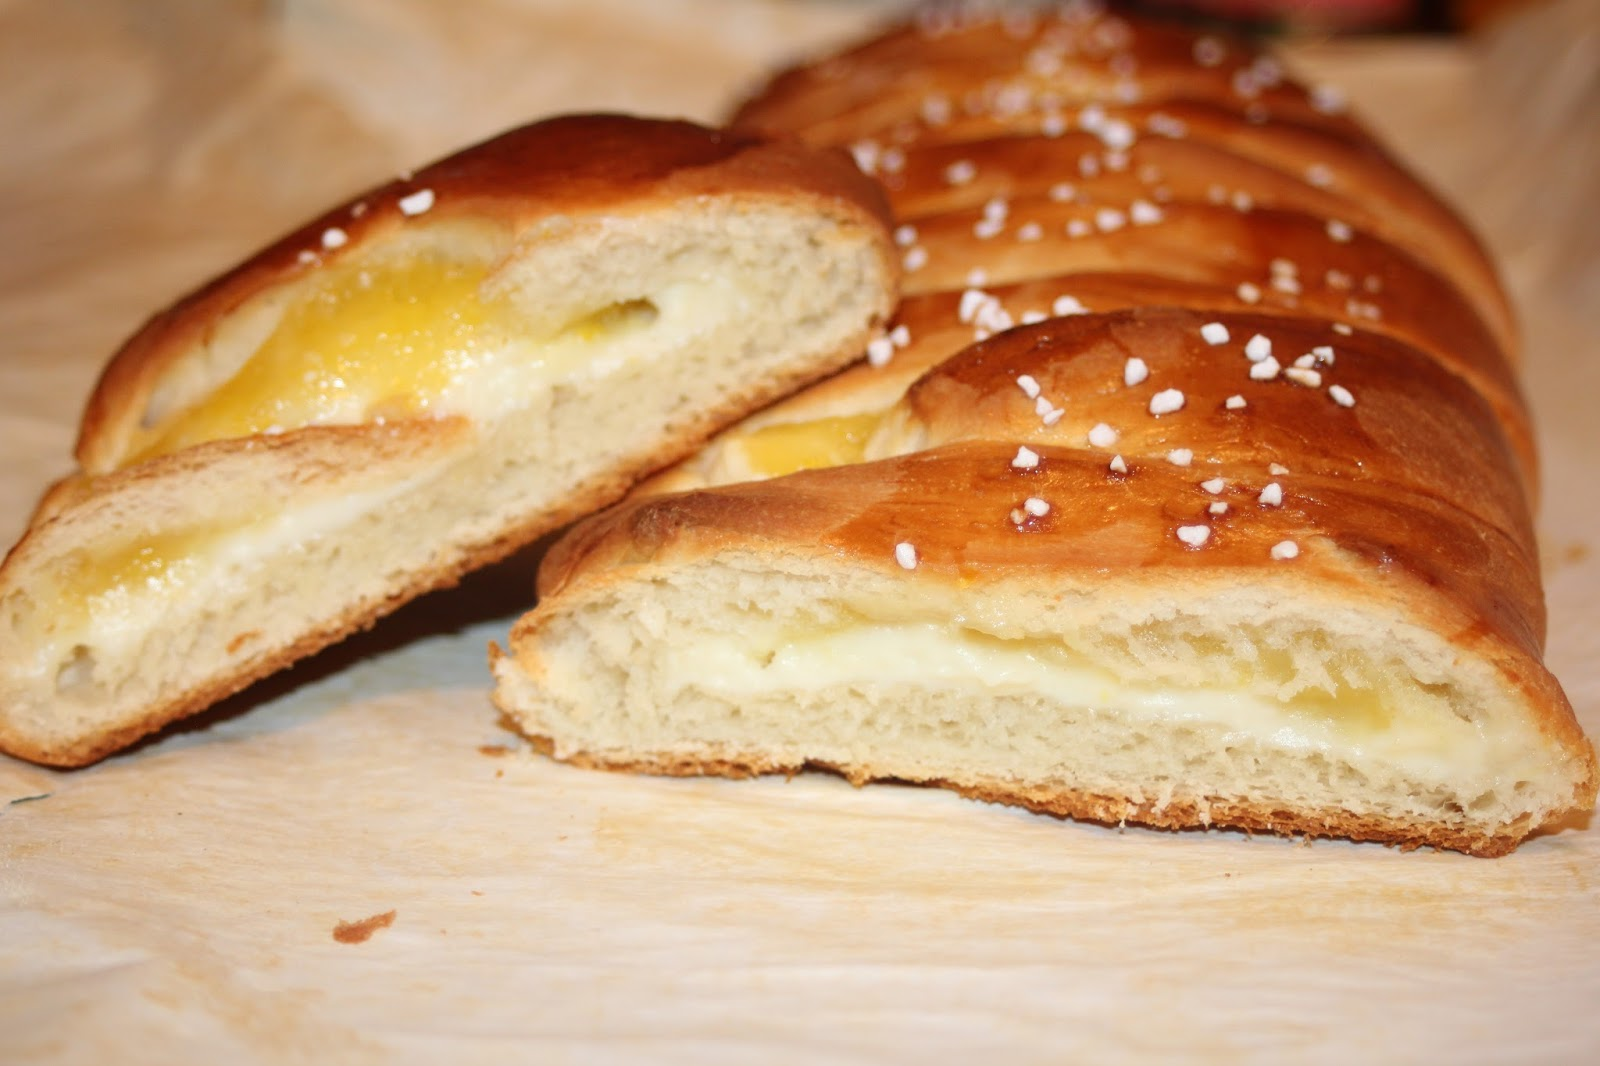 Julie Bakes: Braided stuffed lemon bread